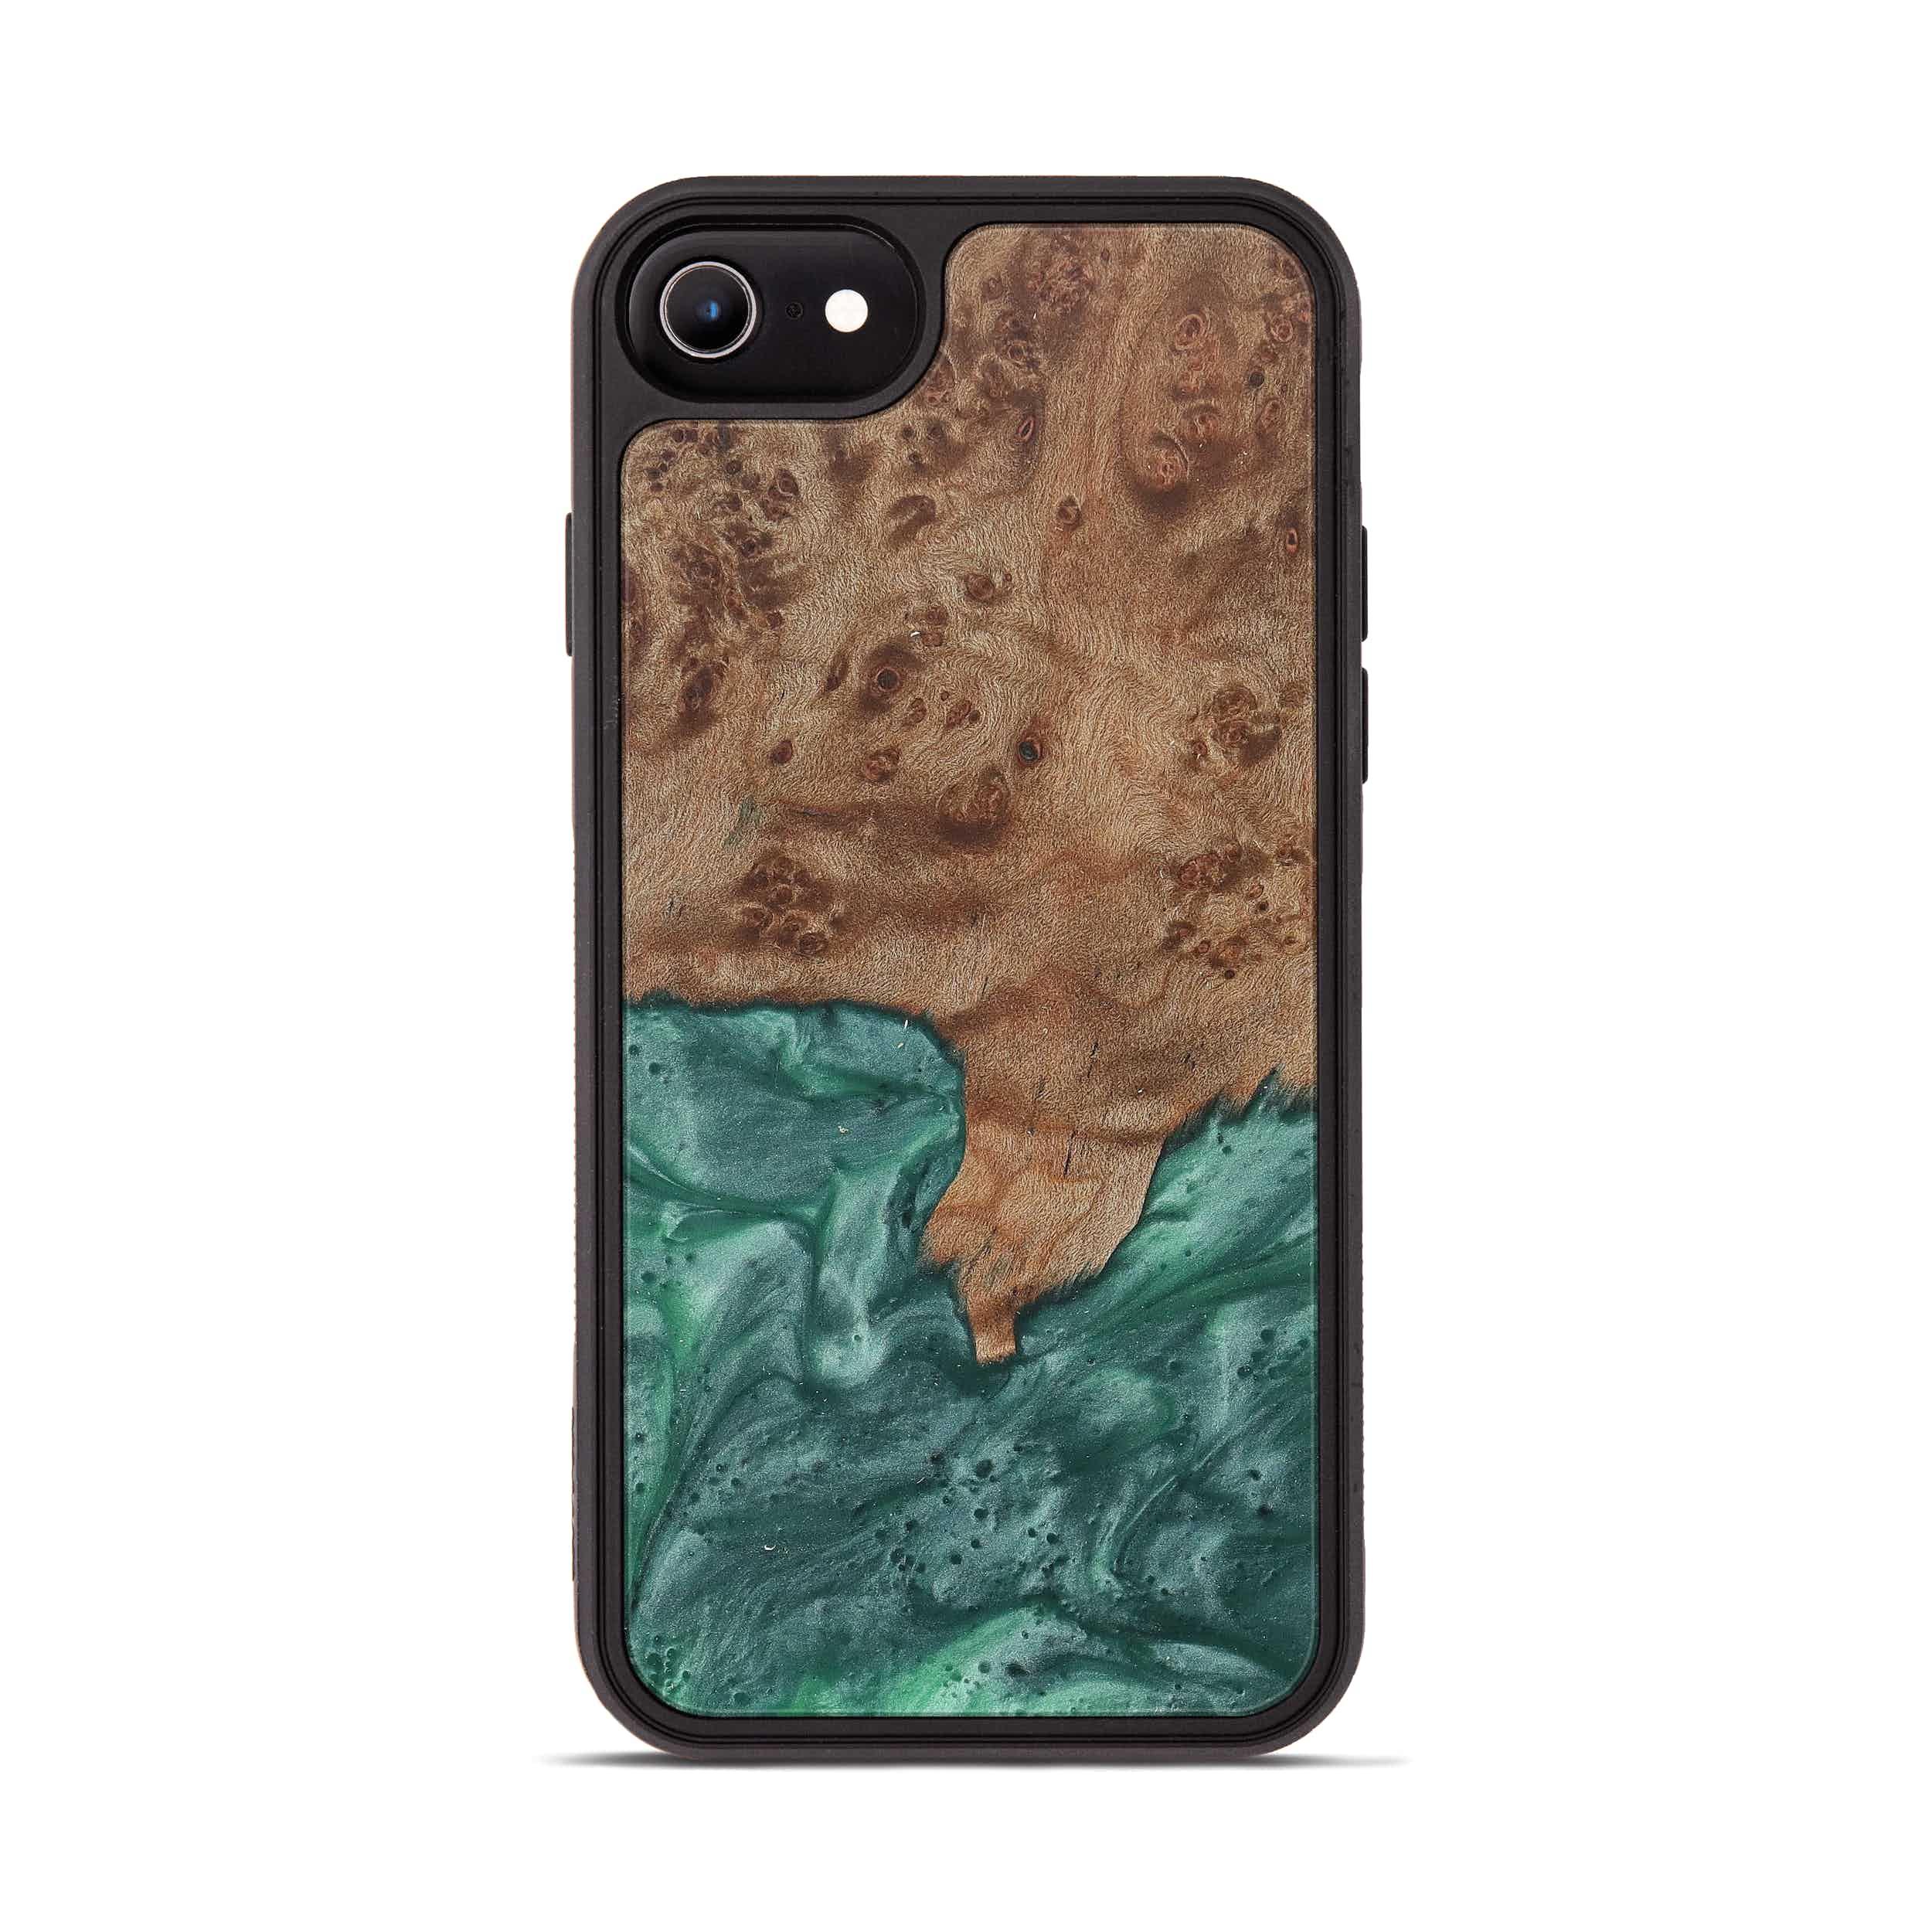 iPhone 6s Wood+Resin Phone Case - Koko (Dark Green, 374560)